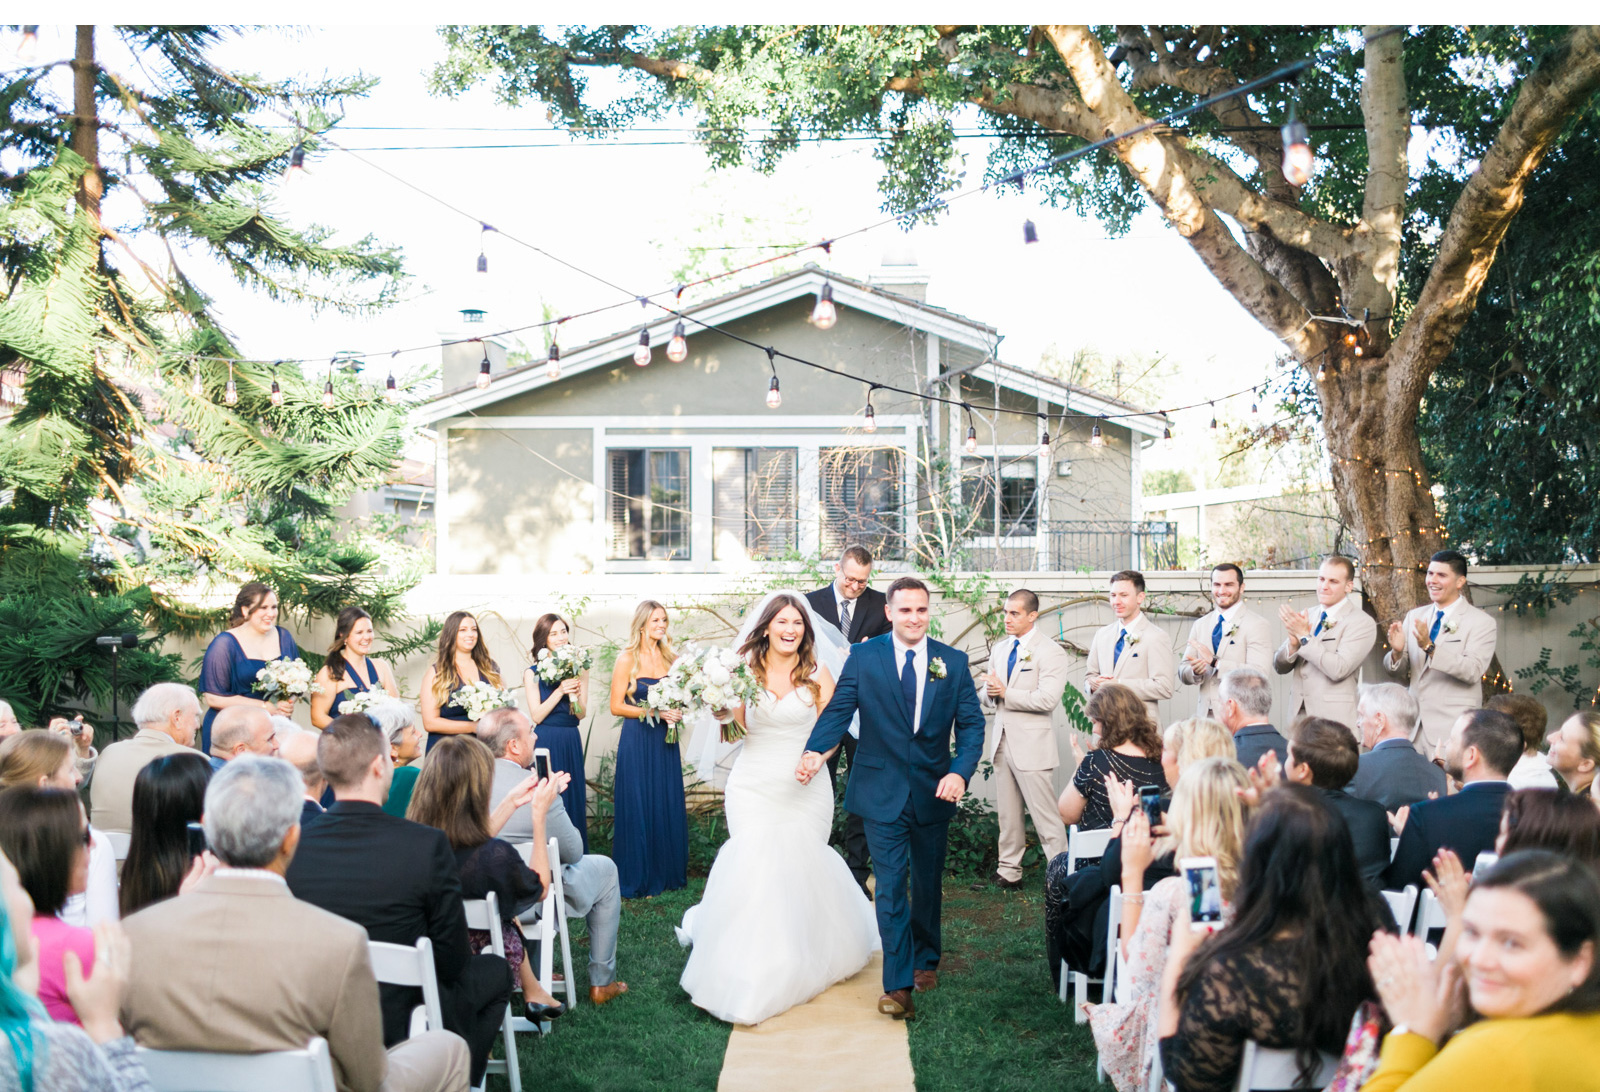 Jon-&-Amanda-Dougher's-Backyard-Wedding-Natalie-Schutt-Photography_05.jpg